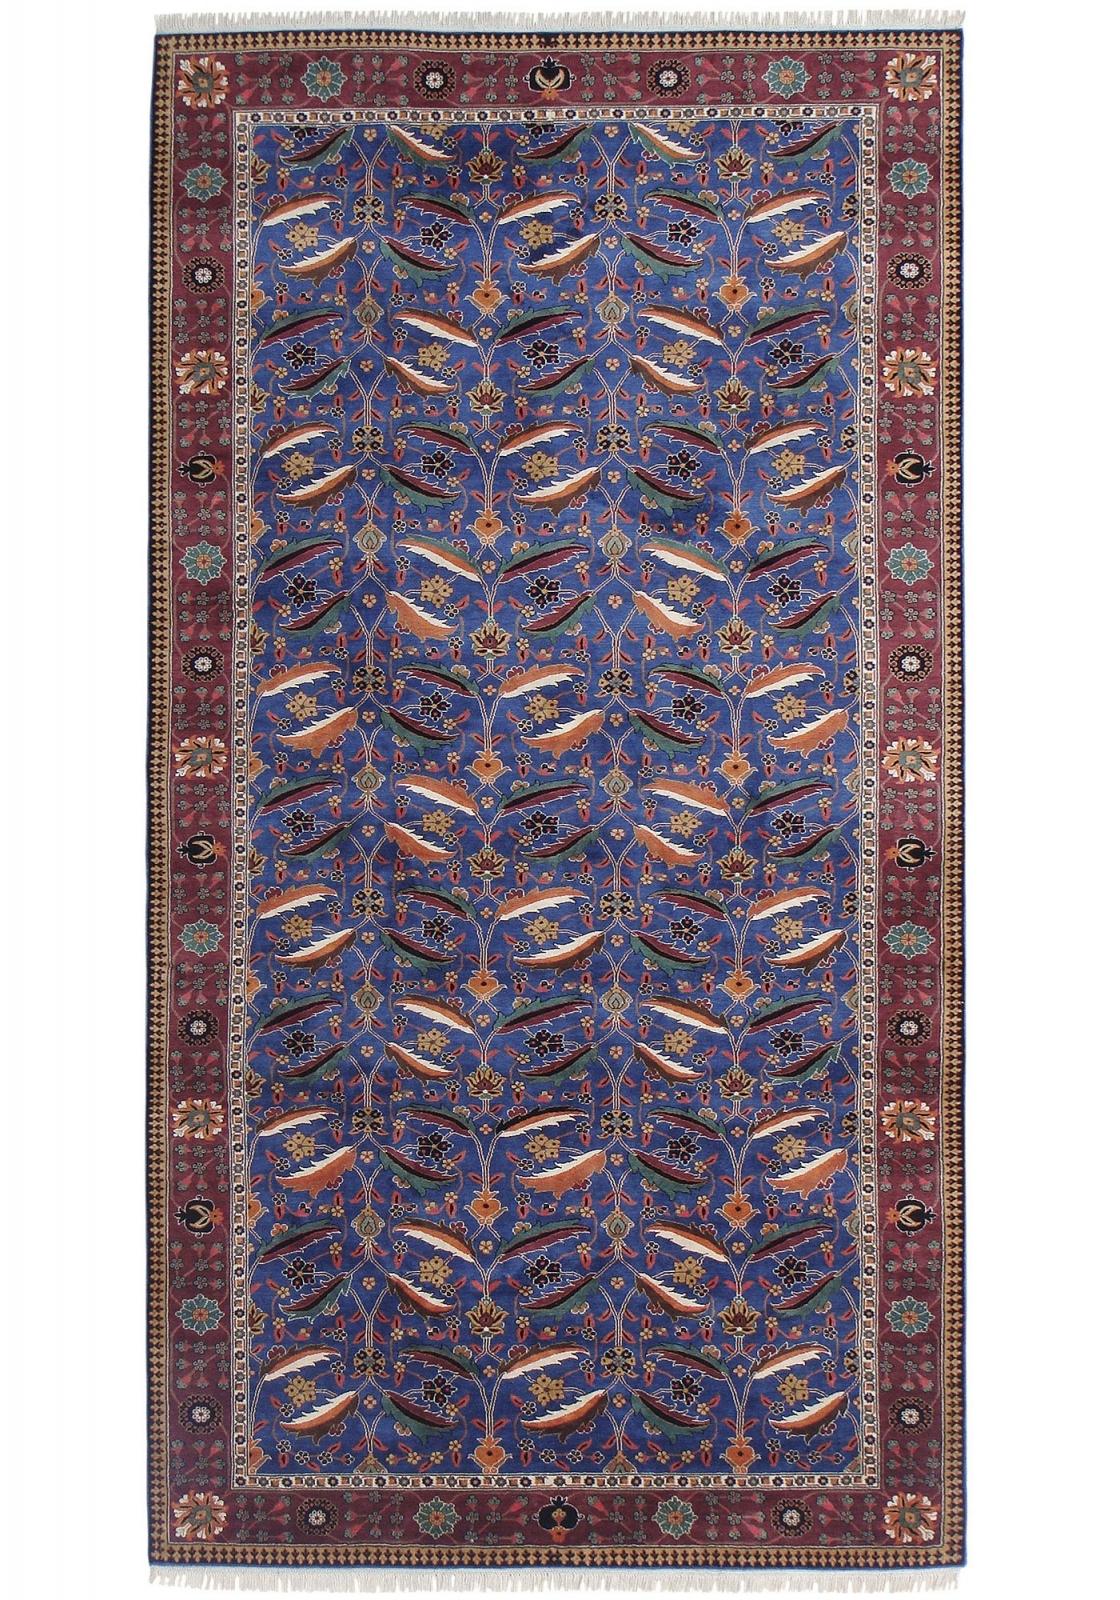 Kirman Vase silk pile carpet